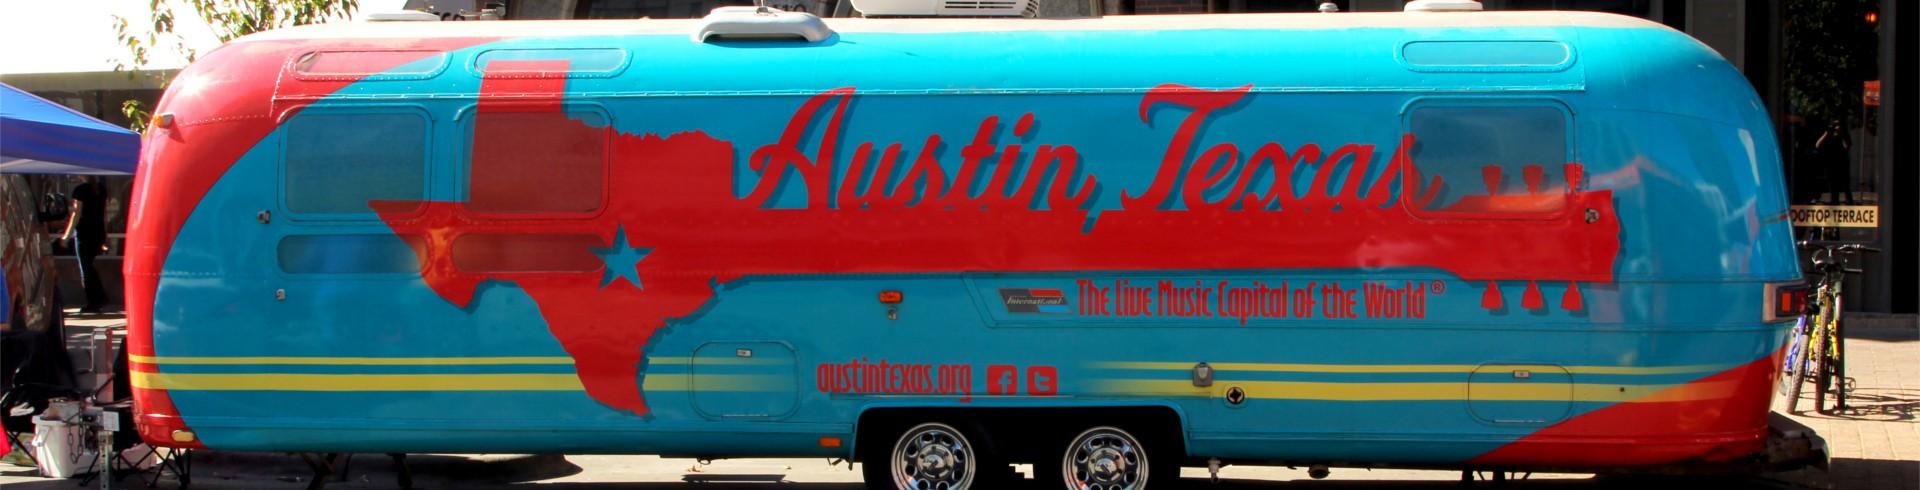 Austin Texas Health Insurance!